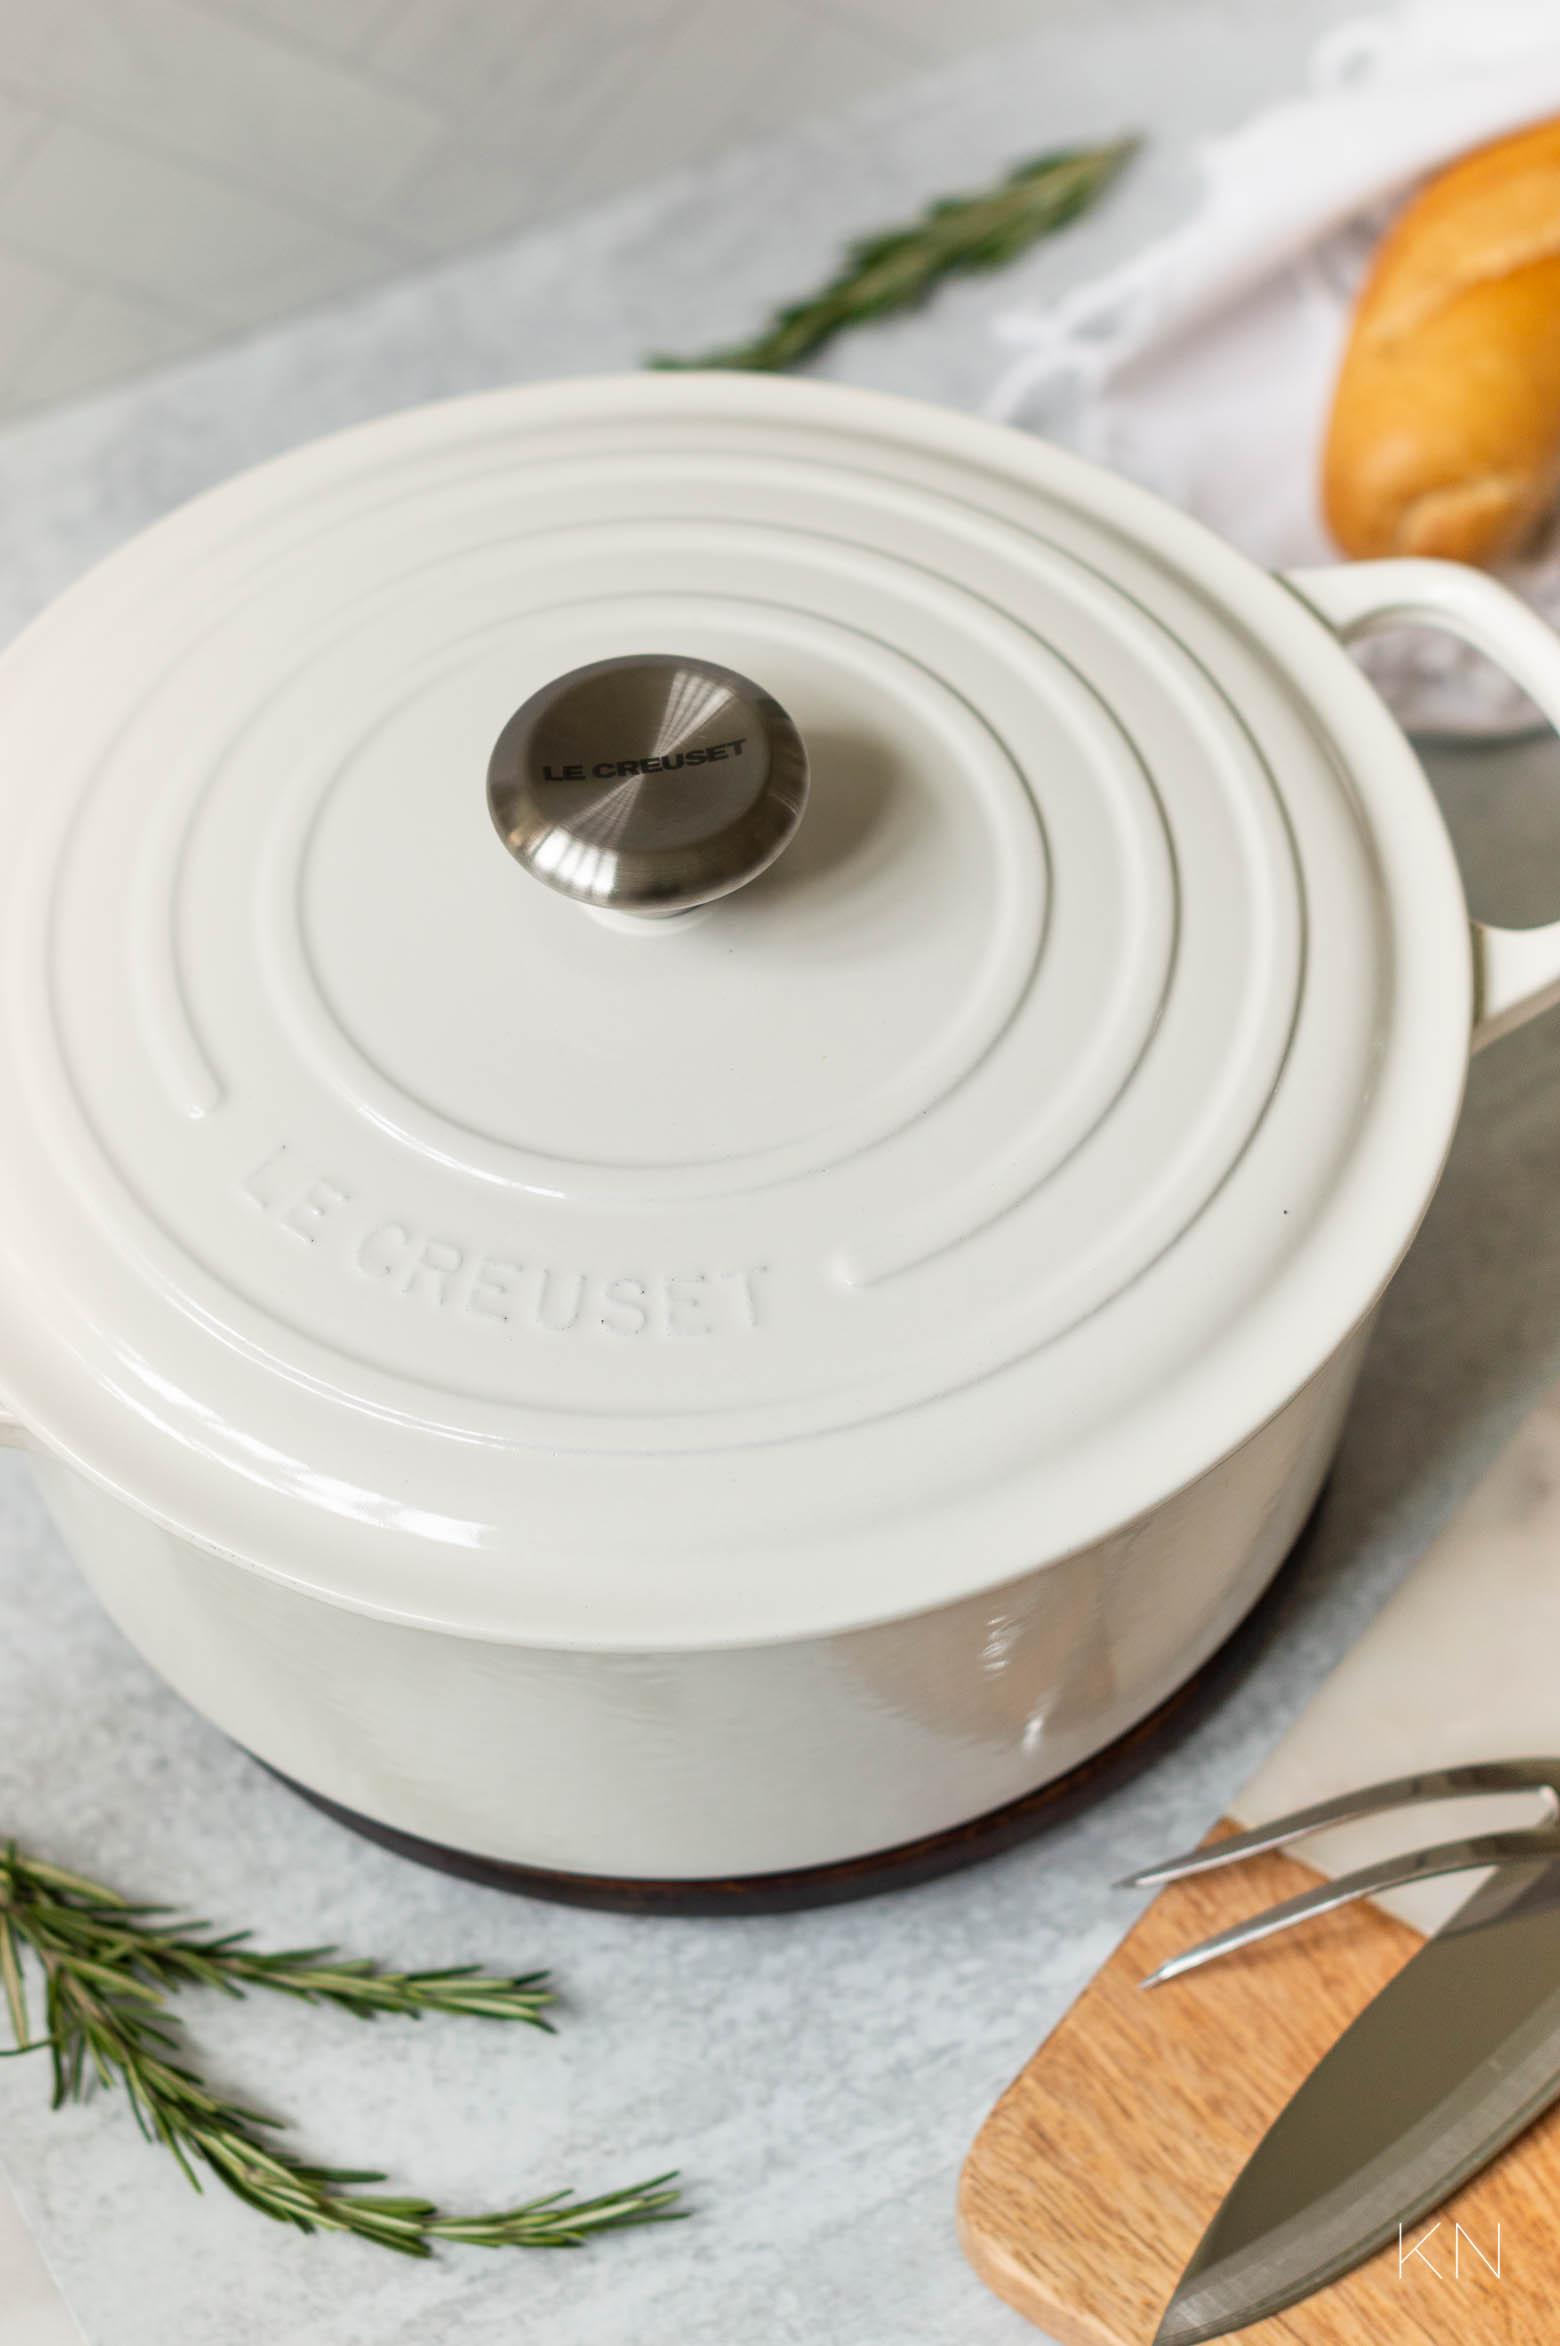 Favorite White Kitchenware